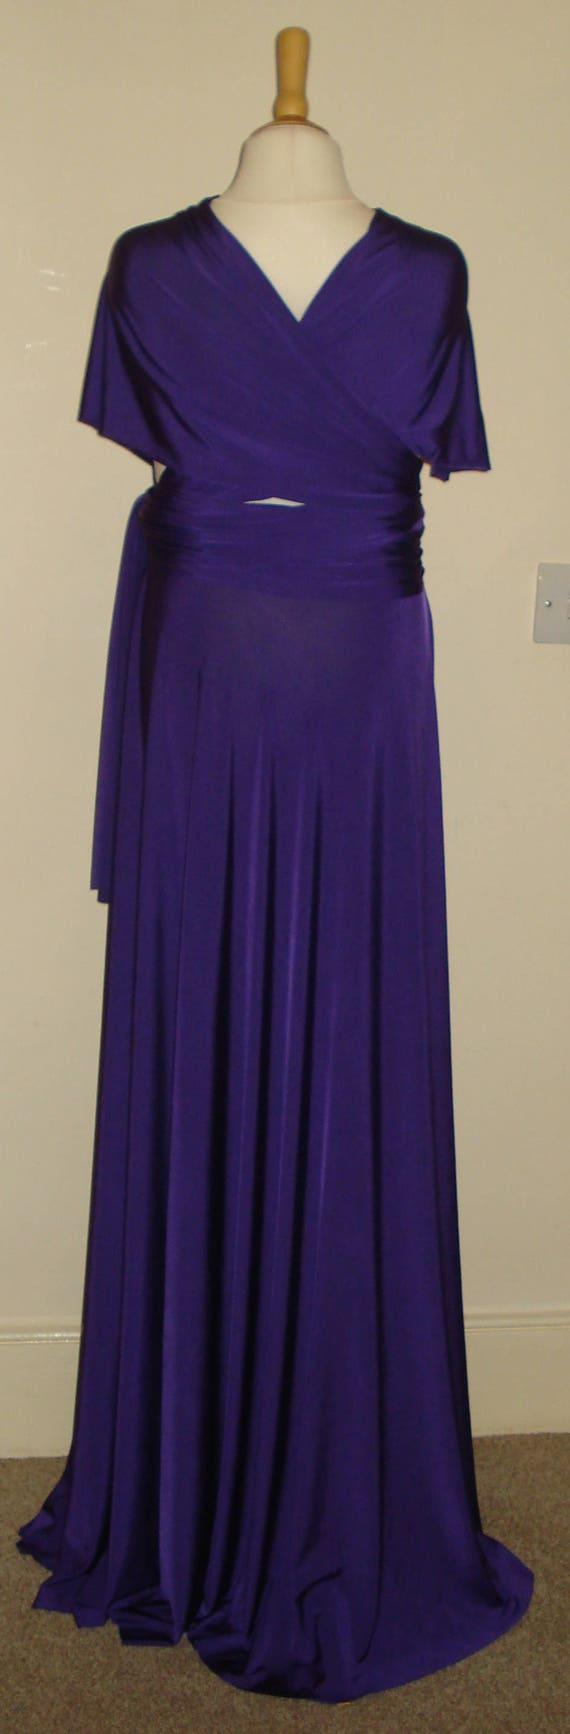 Purple Junior Infinity Dress Flower Girl Dress Teen Bridesmaid